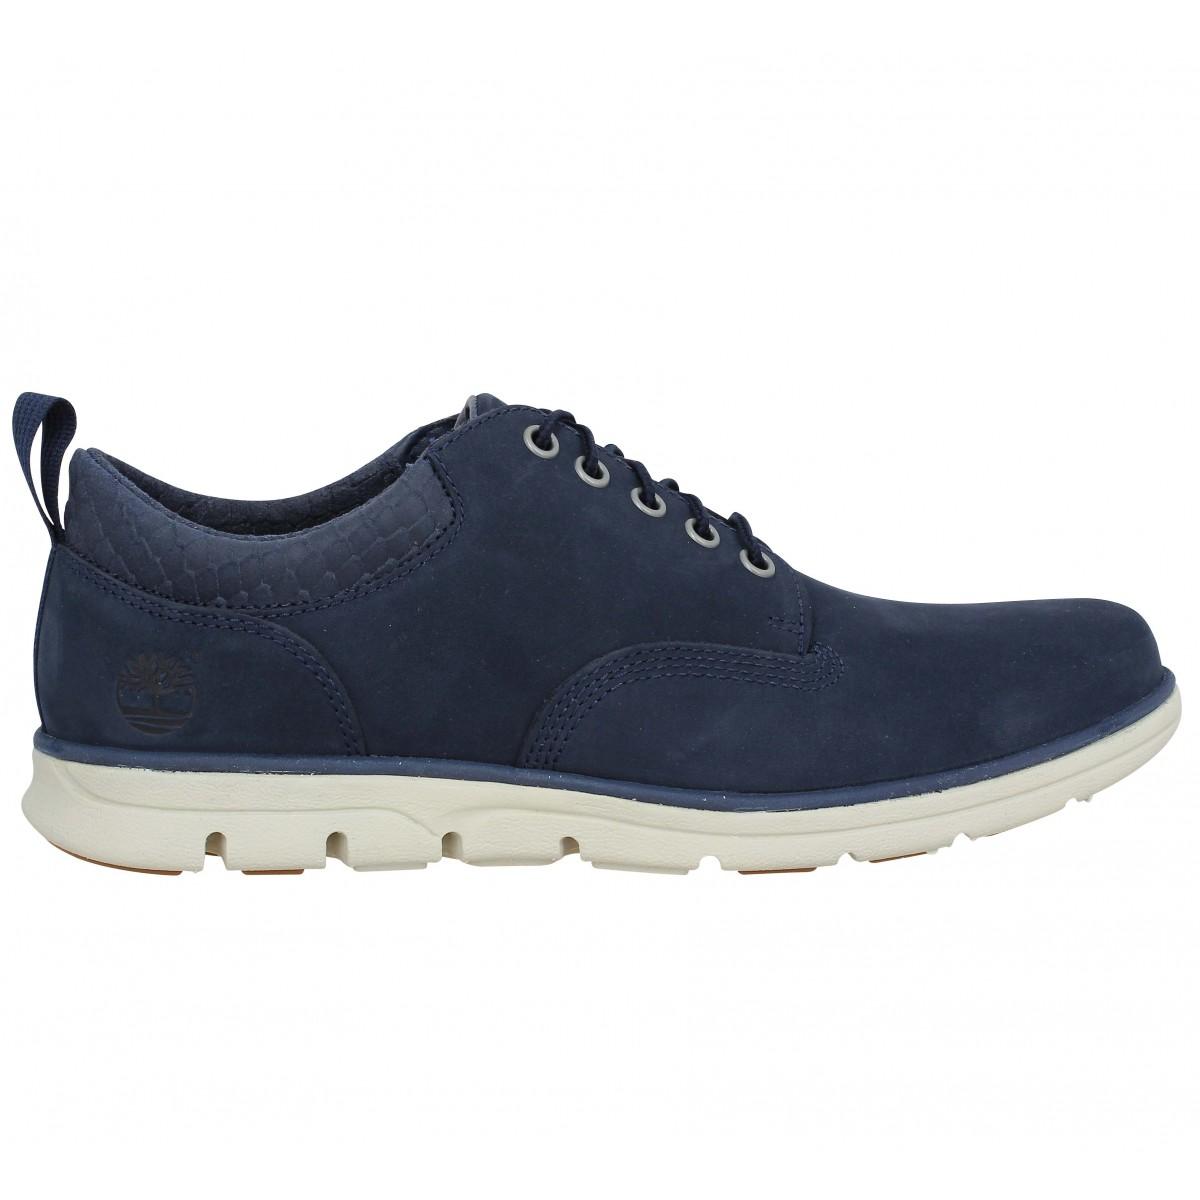 Chaussures De Sport Lage Bradstreet F / L Oxford Timberland XYRLB3bub